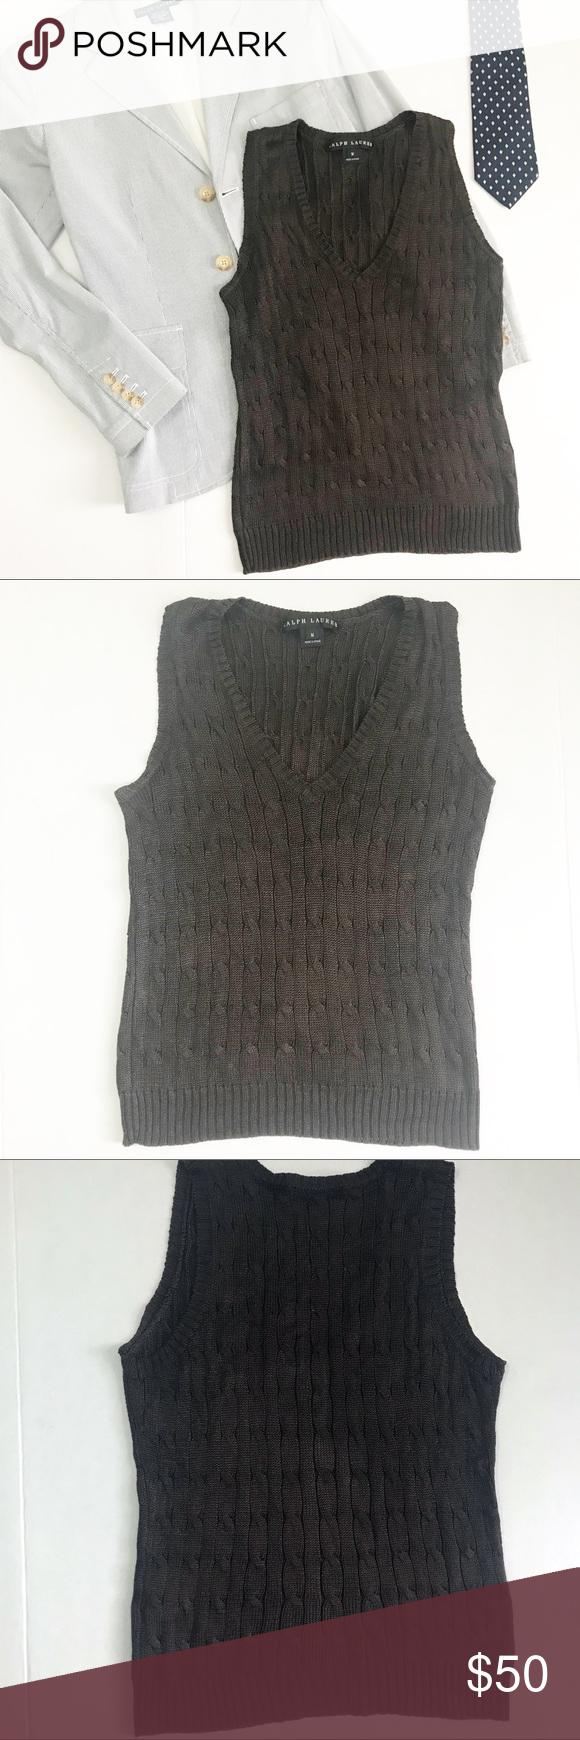 1b267c6335d418 Ralph Lauren Black Label Silk Vest -Ralph Lauren Black Label. -100% silk